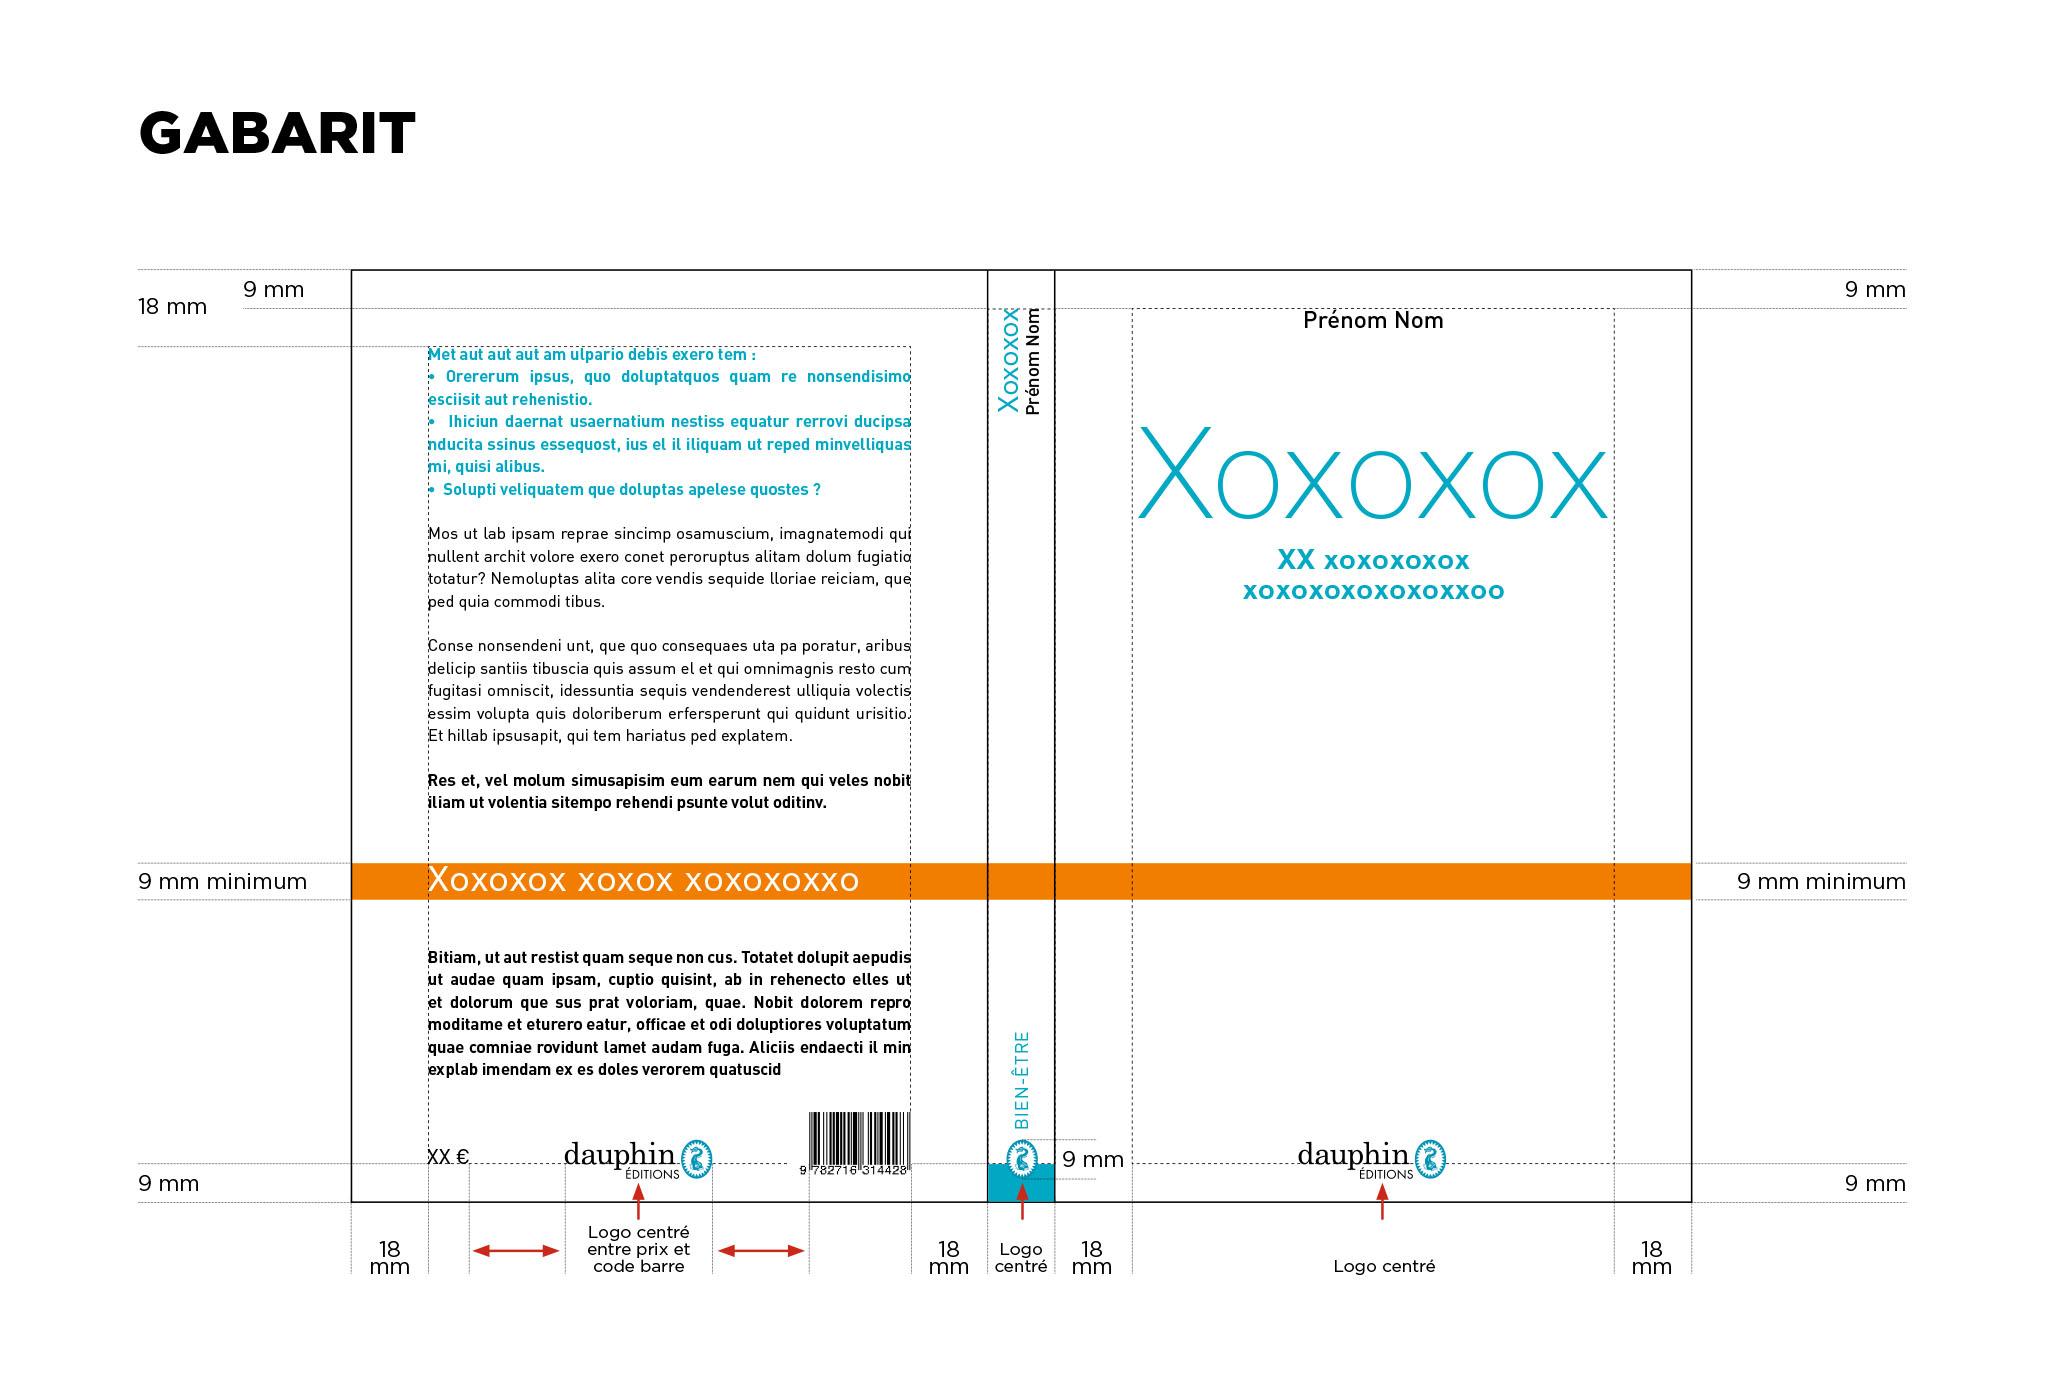 Charte couvertures Dauphin éditions